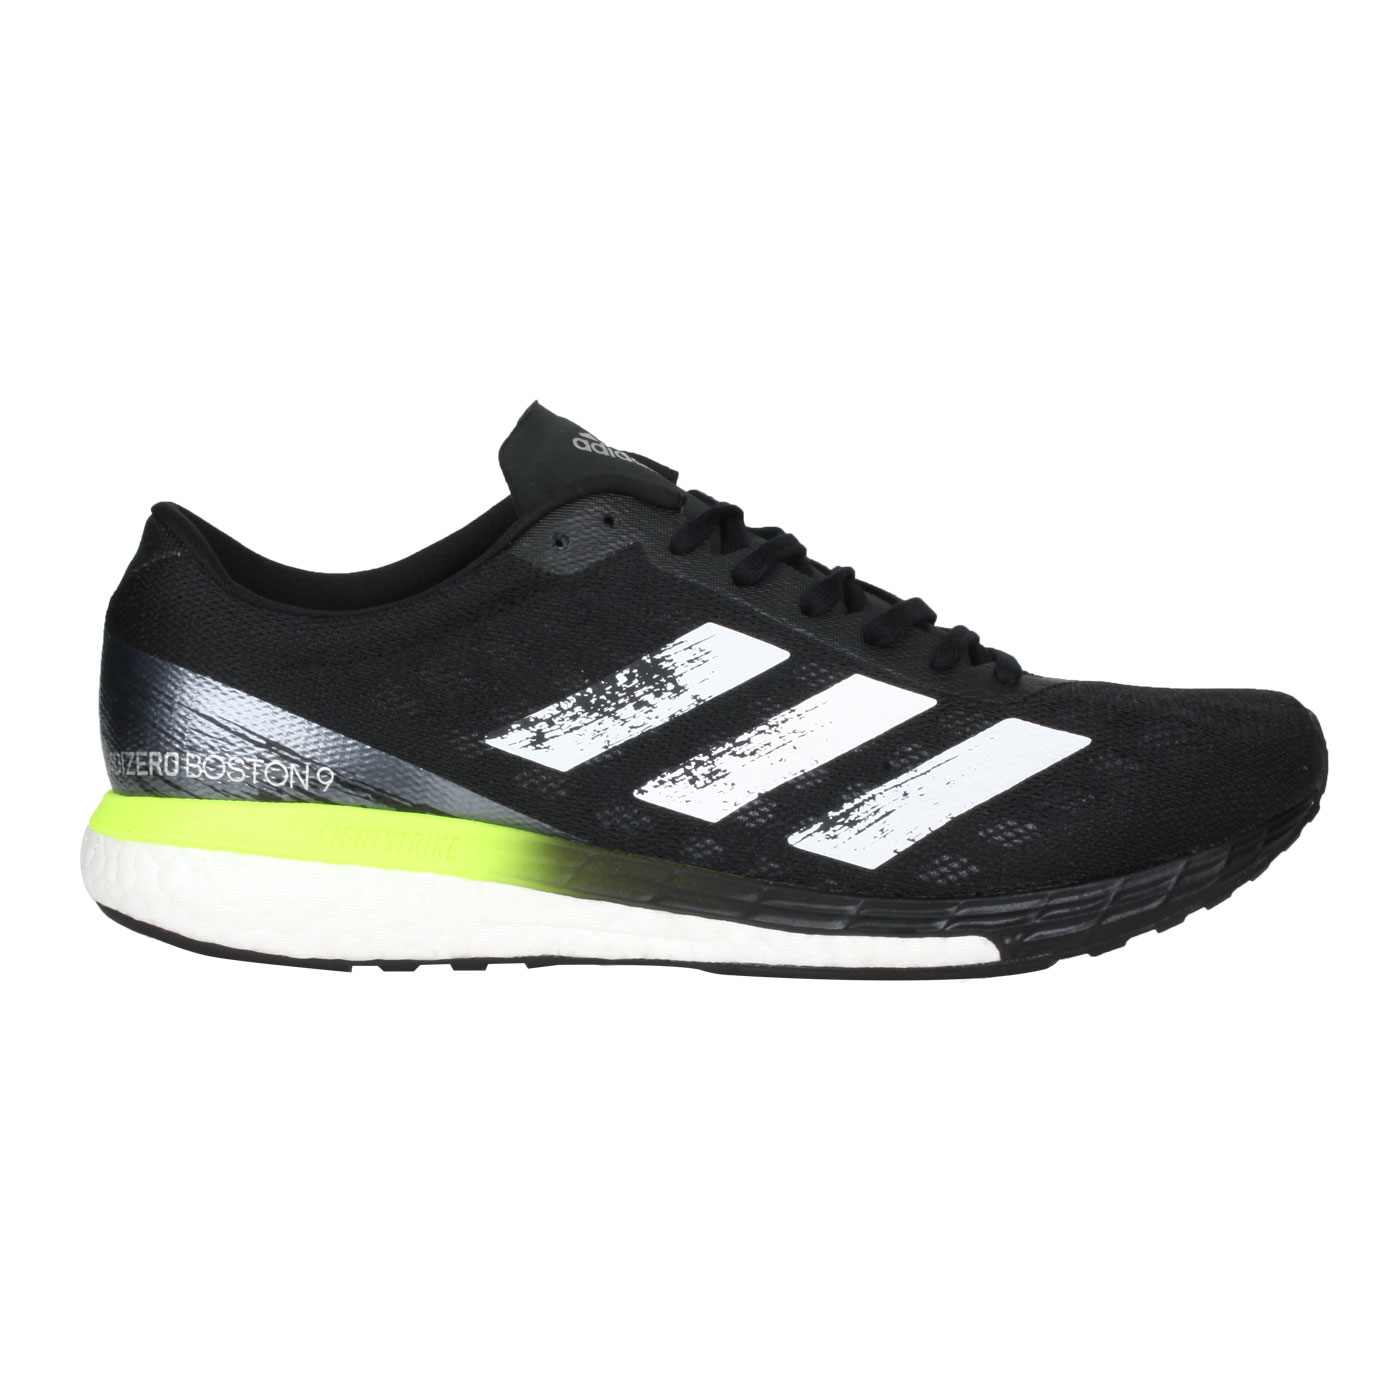 ADIDAS 男款慢跑鞋  @ADIZERO BOSTON 9 M@FY0343 - 黑螢光綠